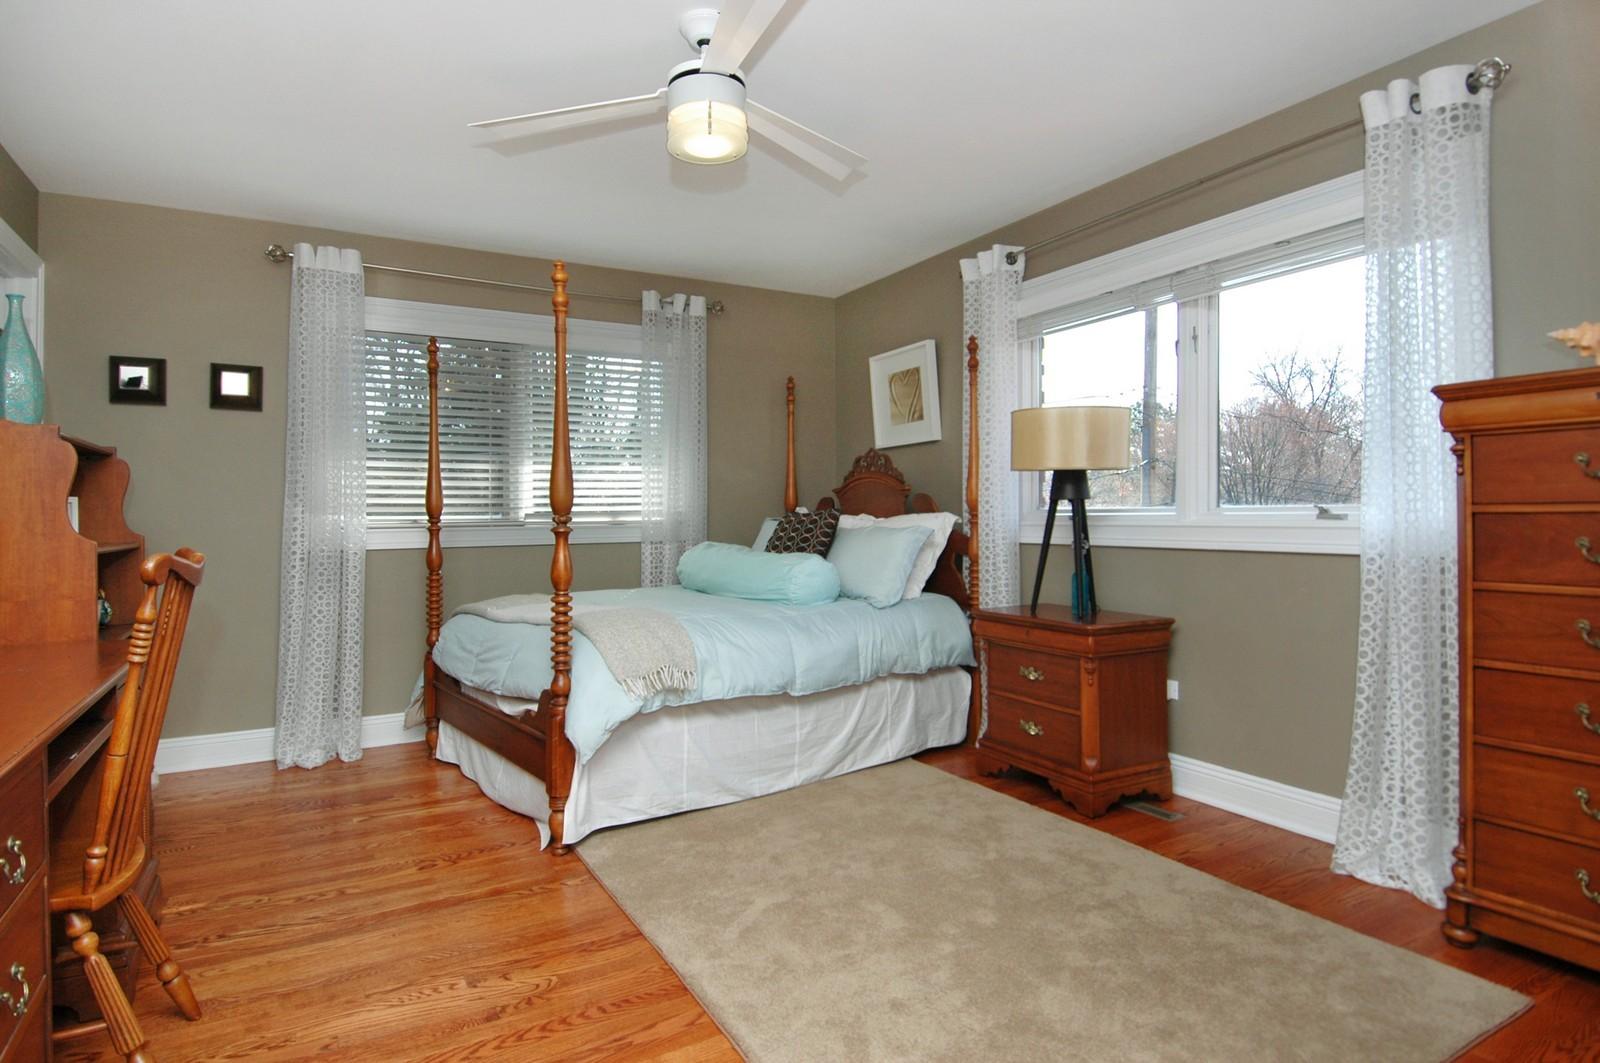 Real Estate Photography - 751 Lake, Crystal Lake, IL, 60014 - Bedroom